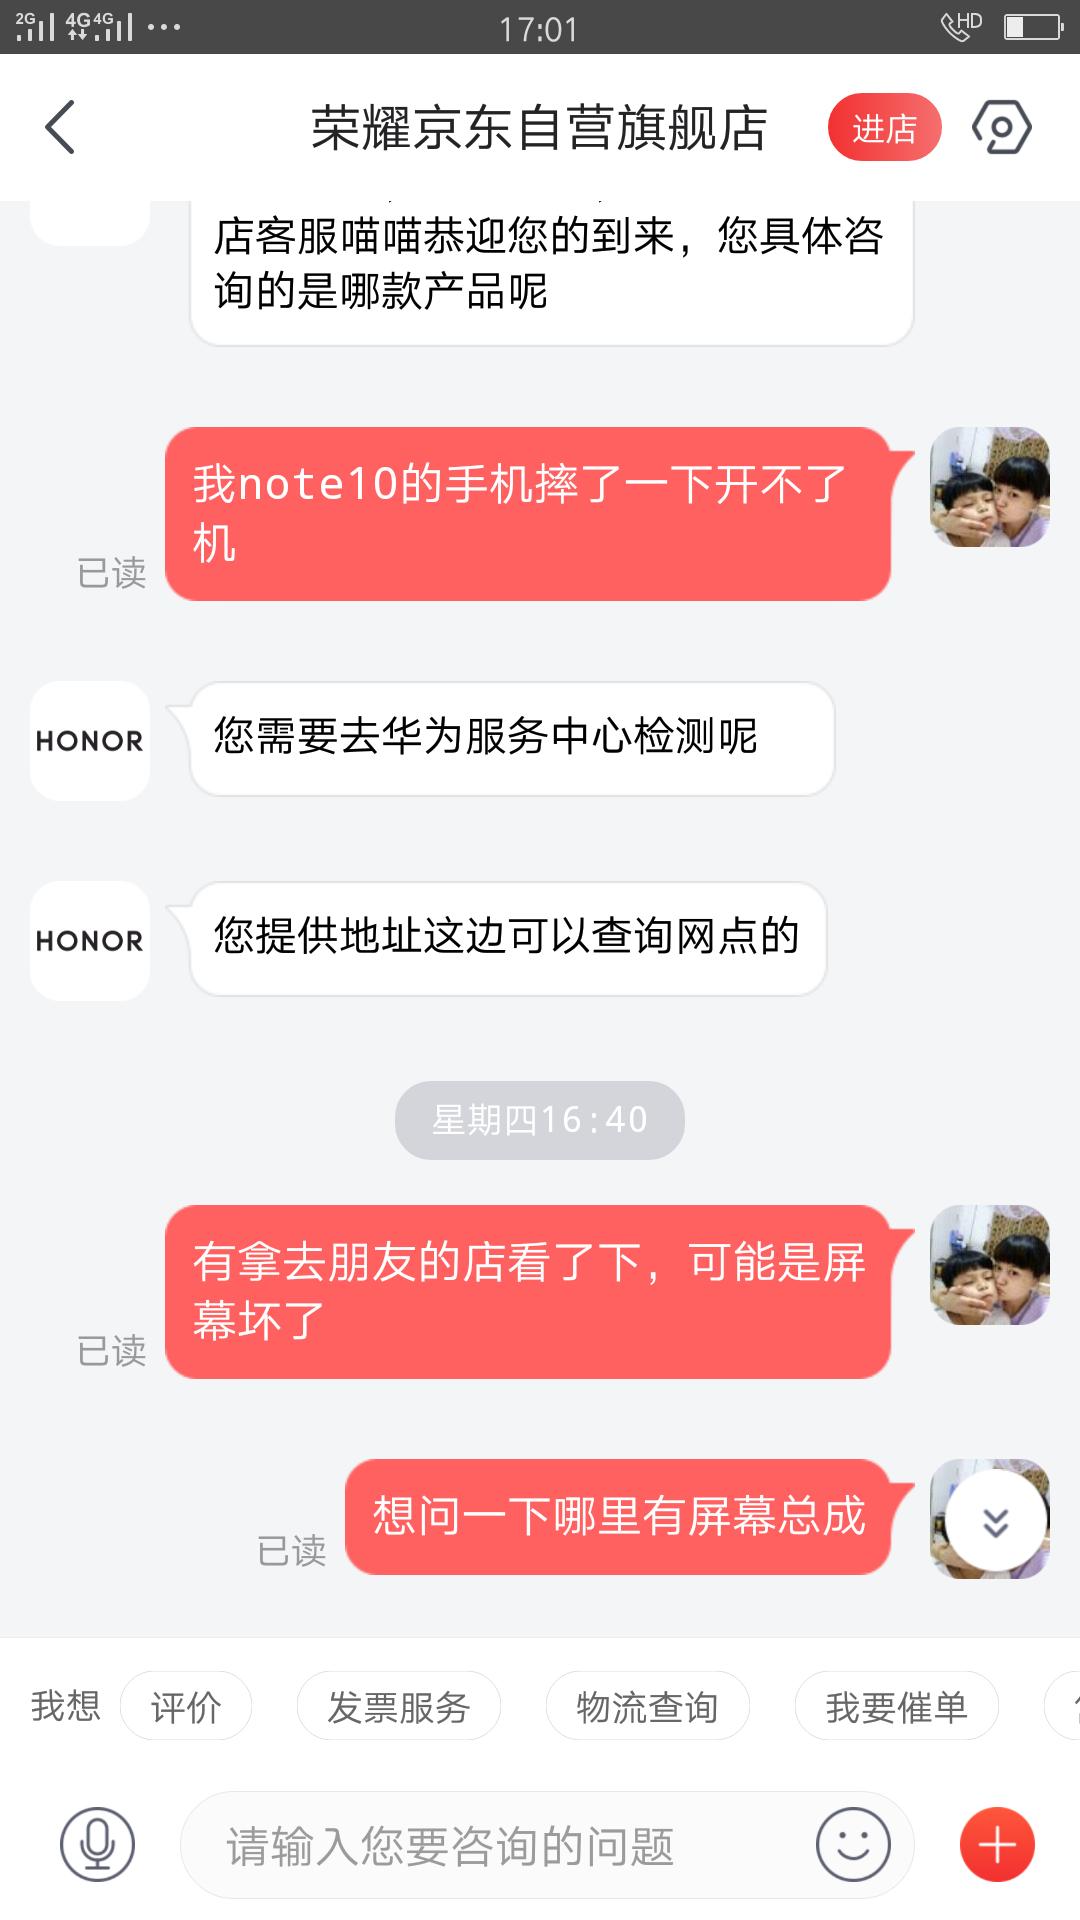 Screenshot_2019-08-24-17-01-06-44.png